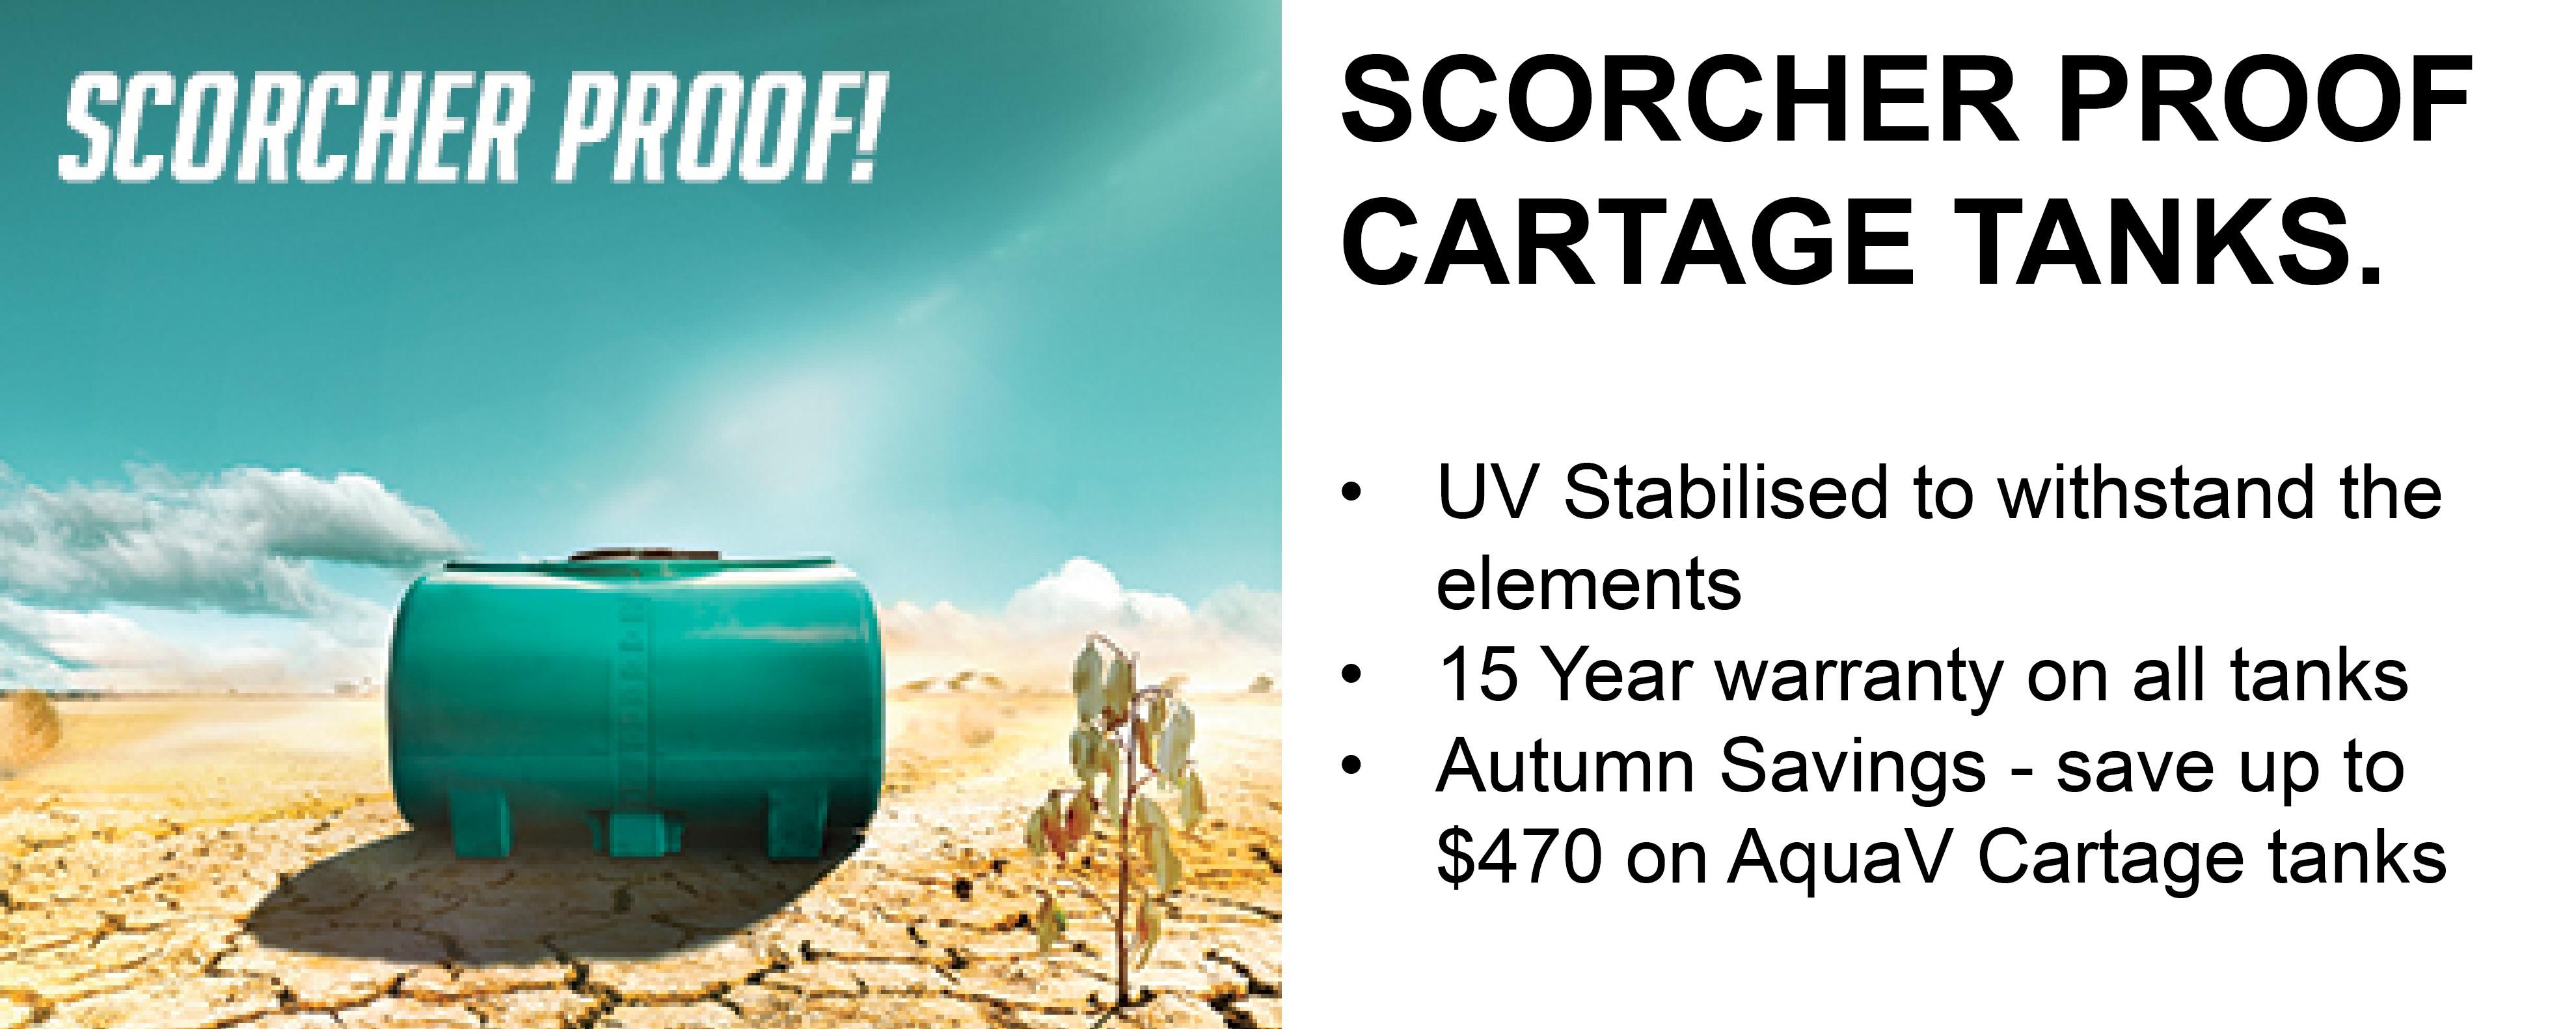 AquaV Cartage Tanks.jpg